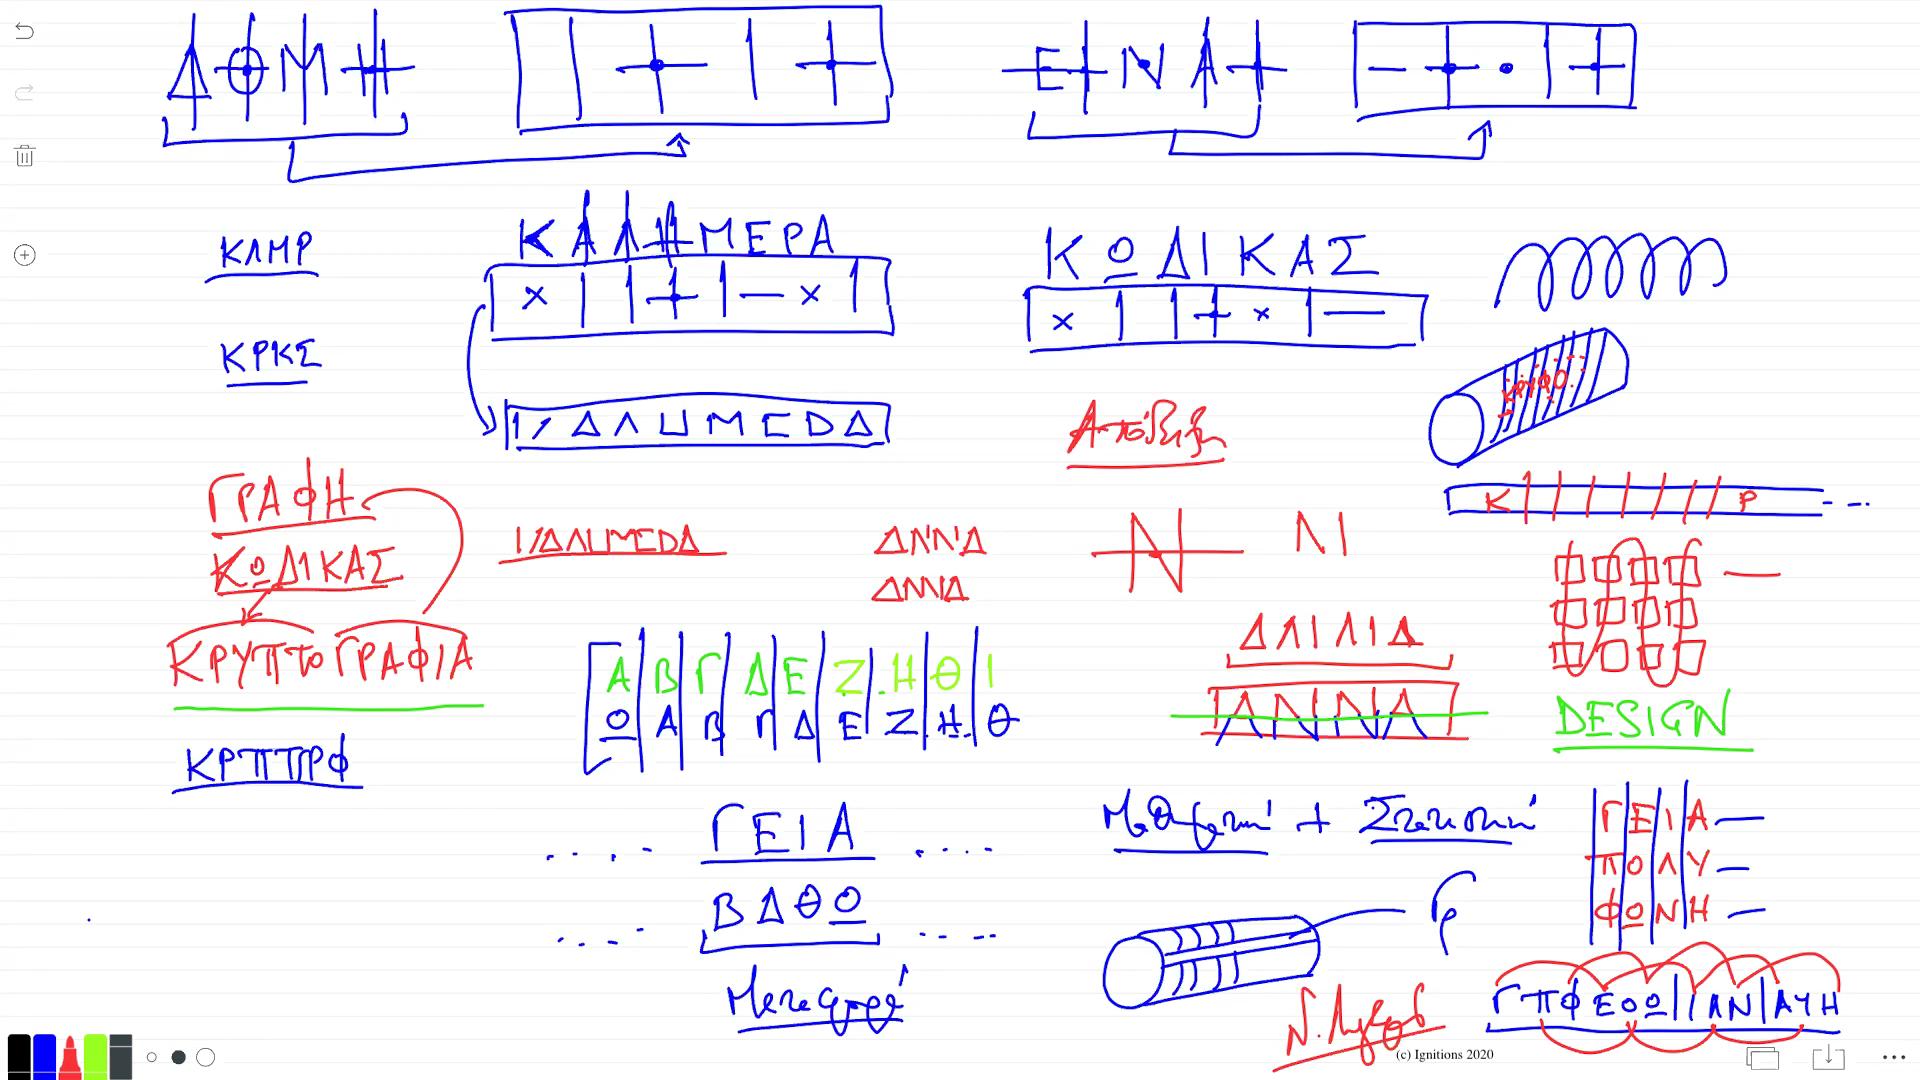 56127 - II - Γραφή, Κώδικες και Κρυπτογραφία. (Dessin)